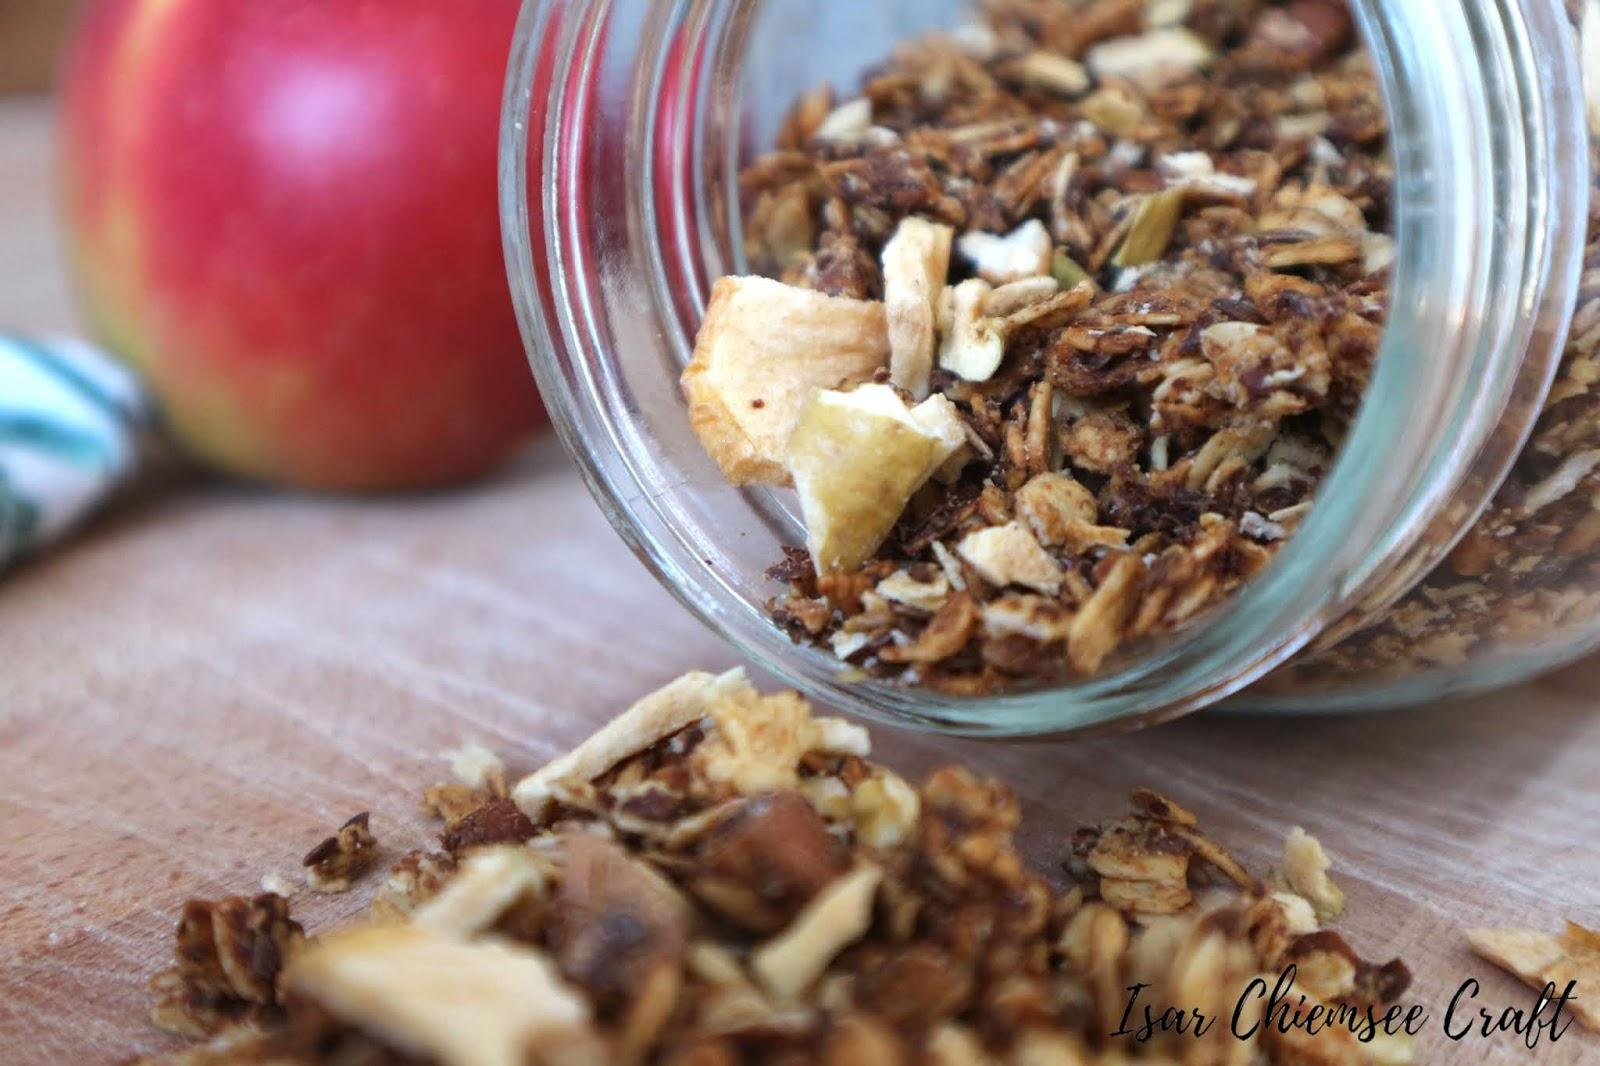 Frühstücksideen: Granola mit Apfelmus und Kokos